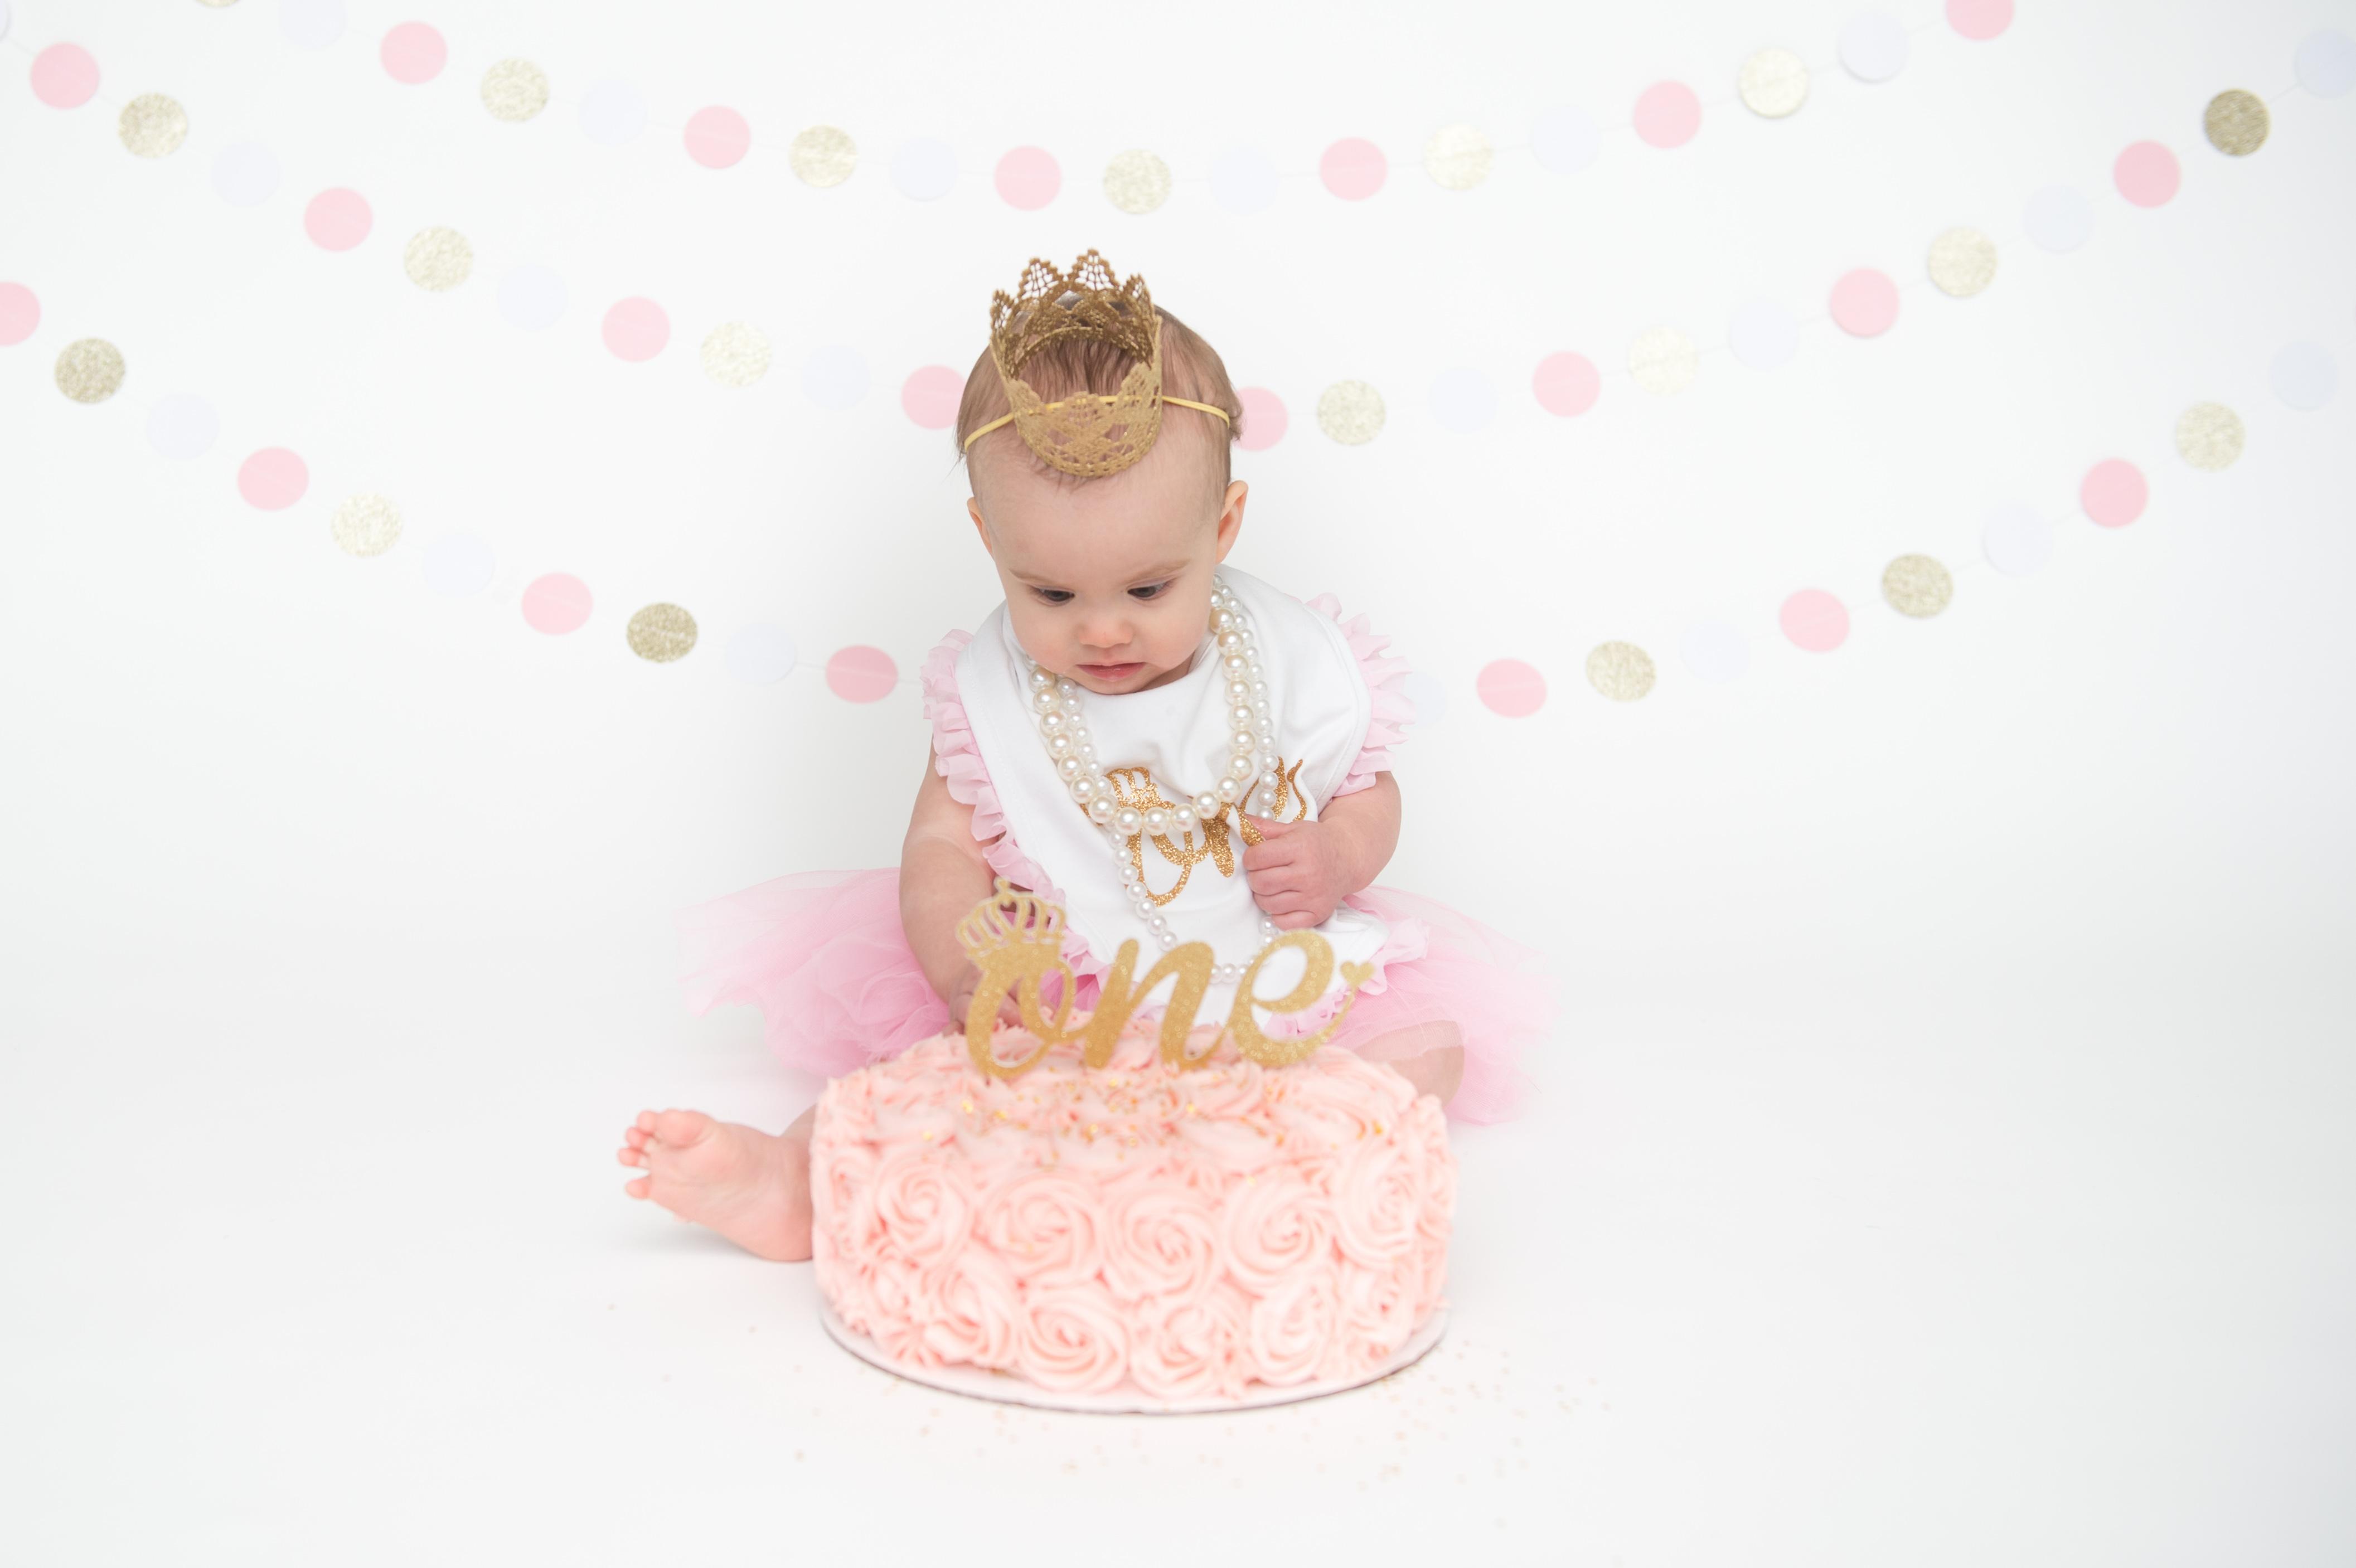 Planning A Cake Smash